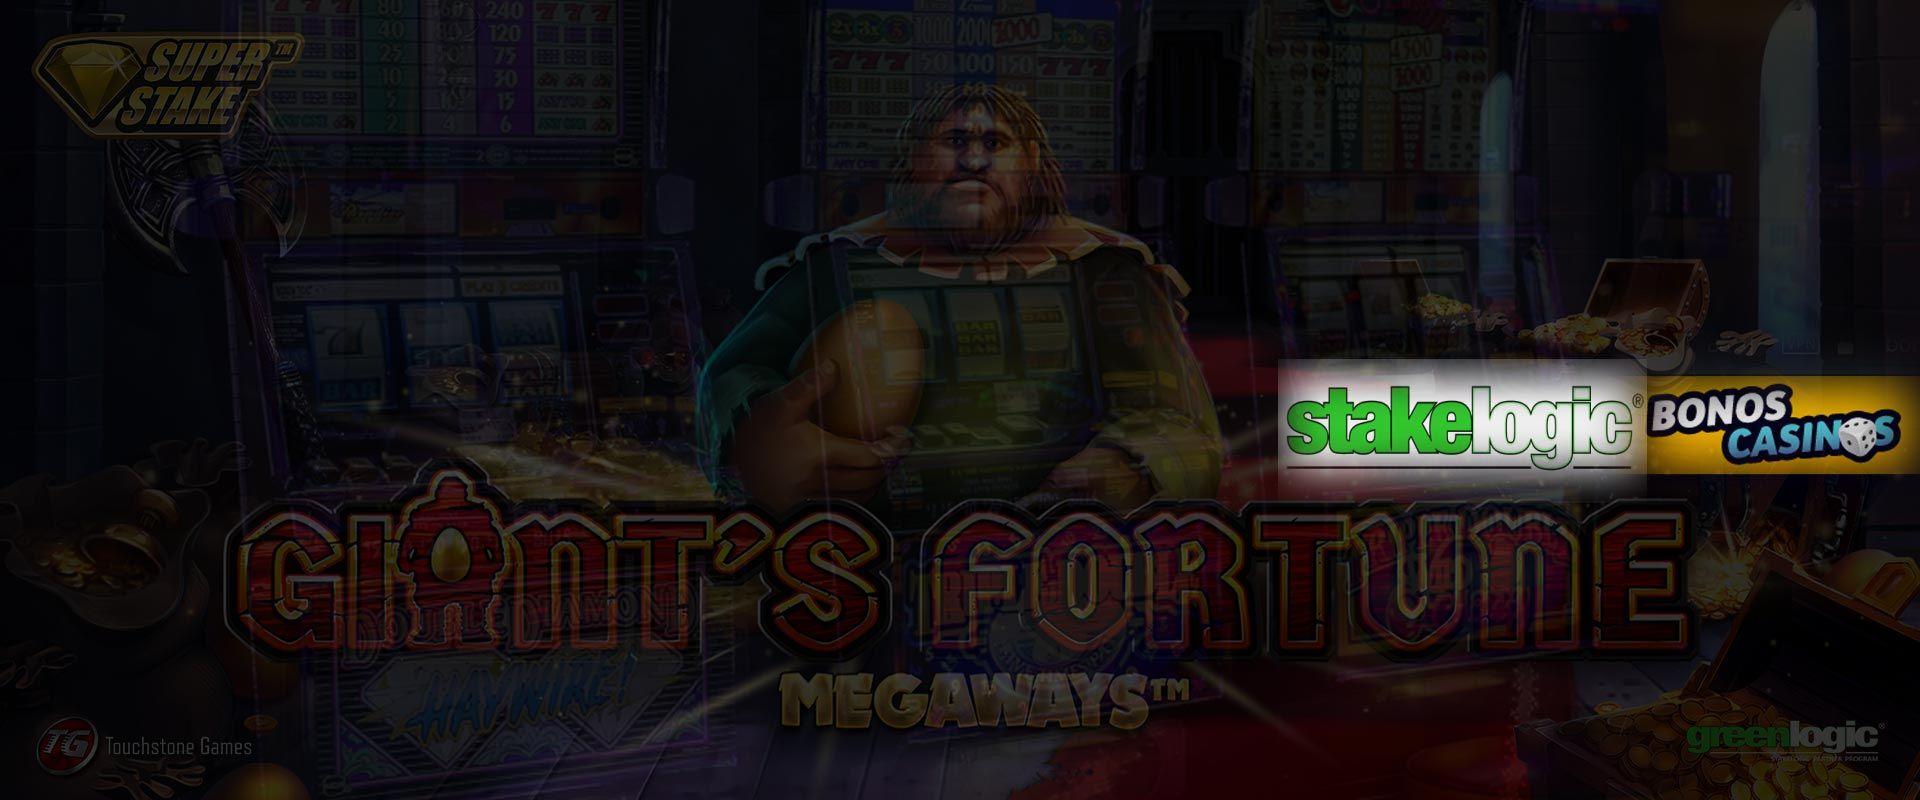 logo de Giant's Fortune Megaways, lo nuevo de Stakelogic